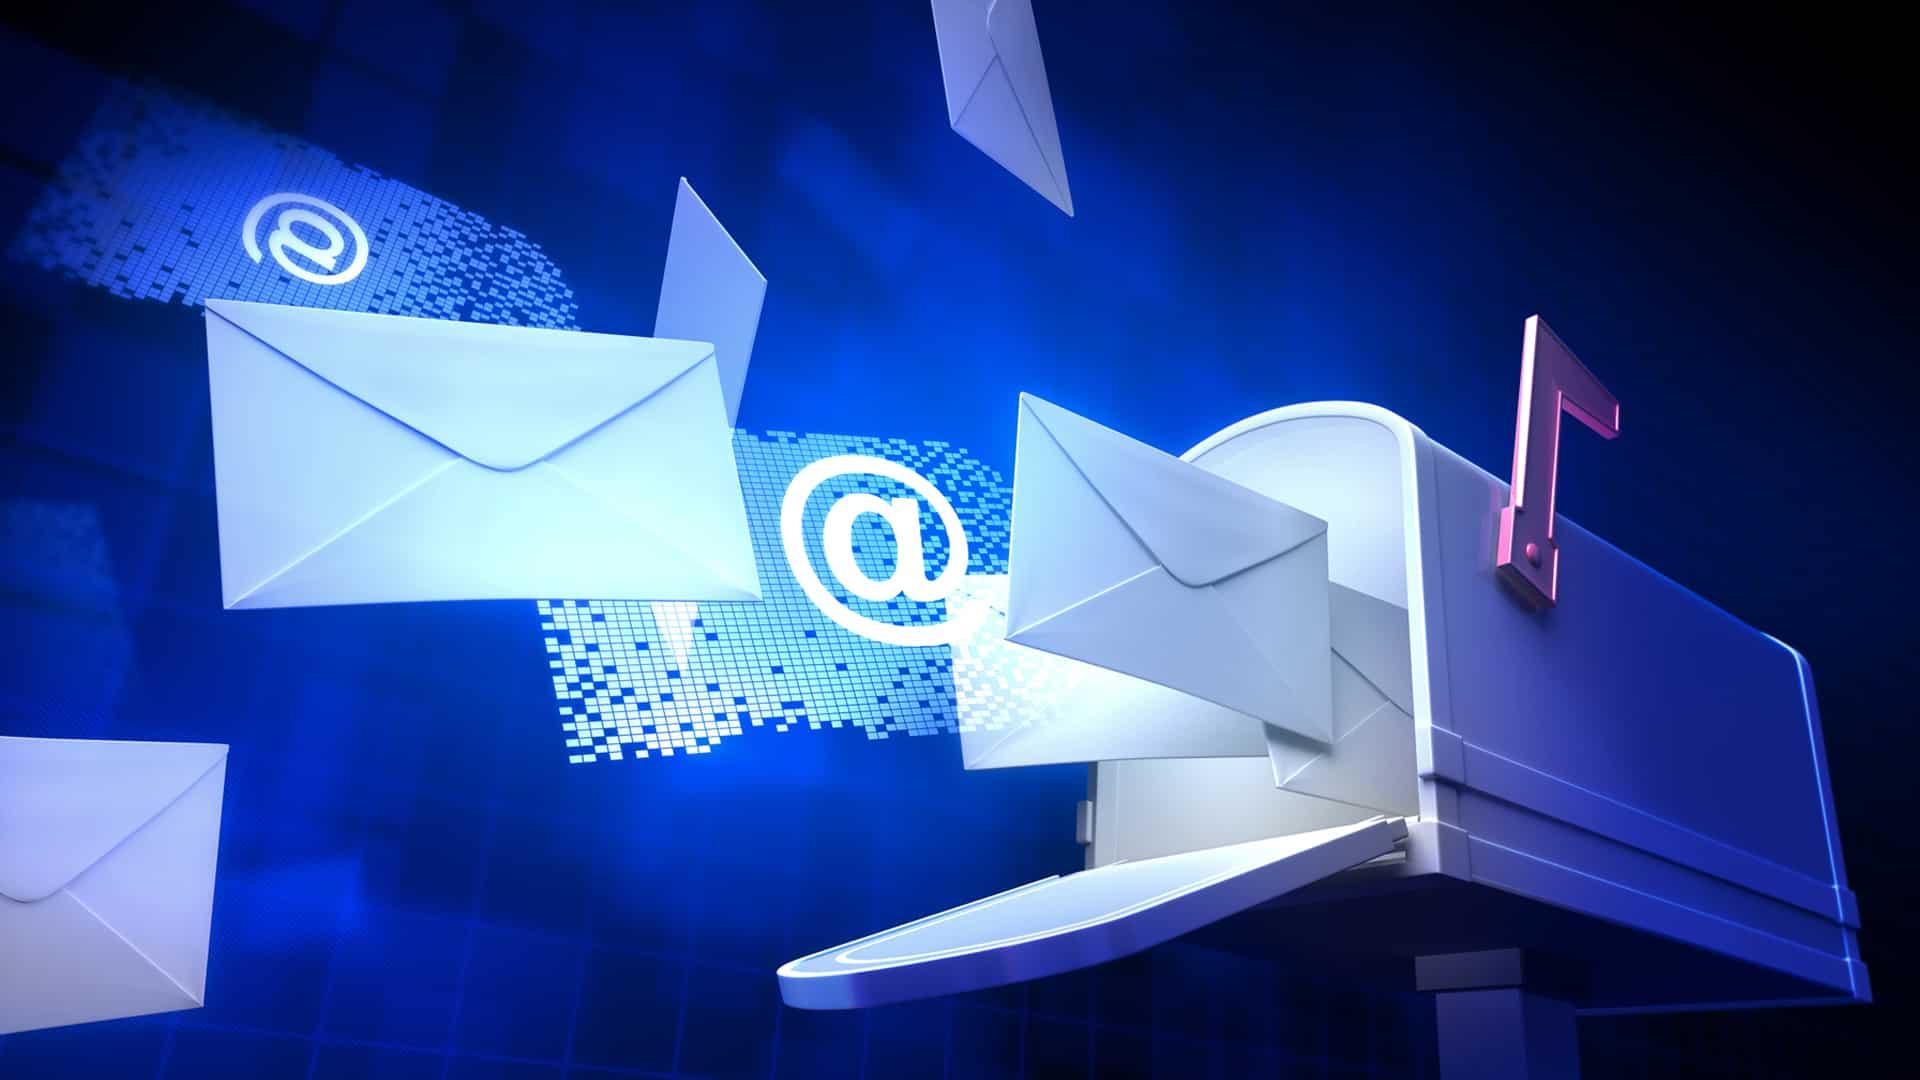 Email-Marketing-1 المفاتيح الخمسة لبناء قائمة بريدية نشيطة و مربحة